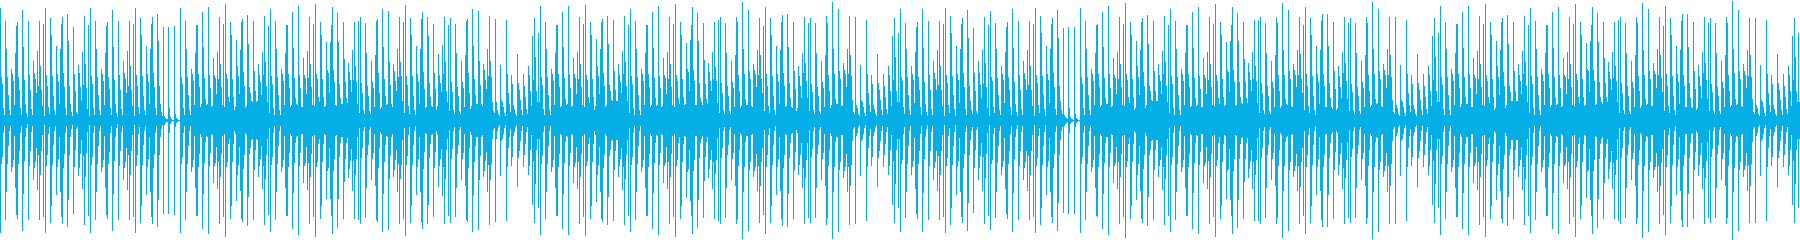 YouTubeオープニング・ほのぼの日常の再生済みの波形